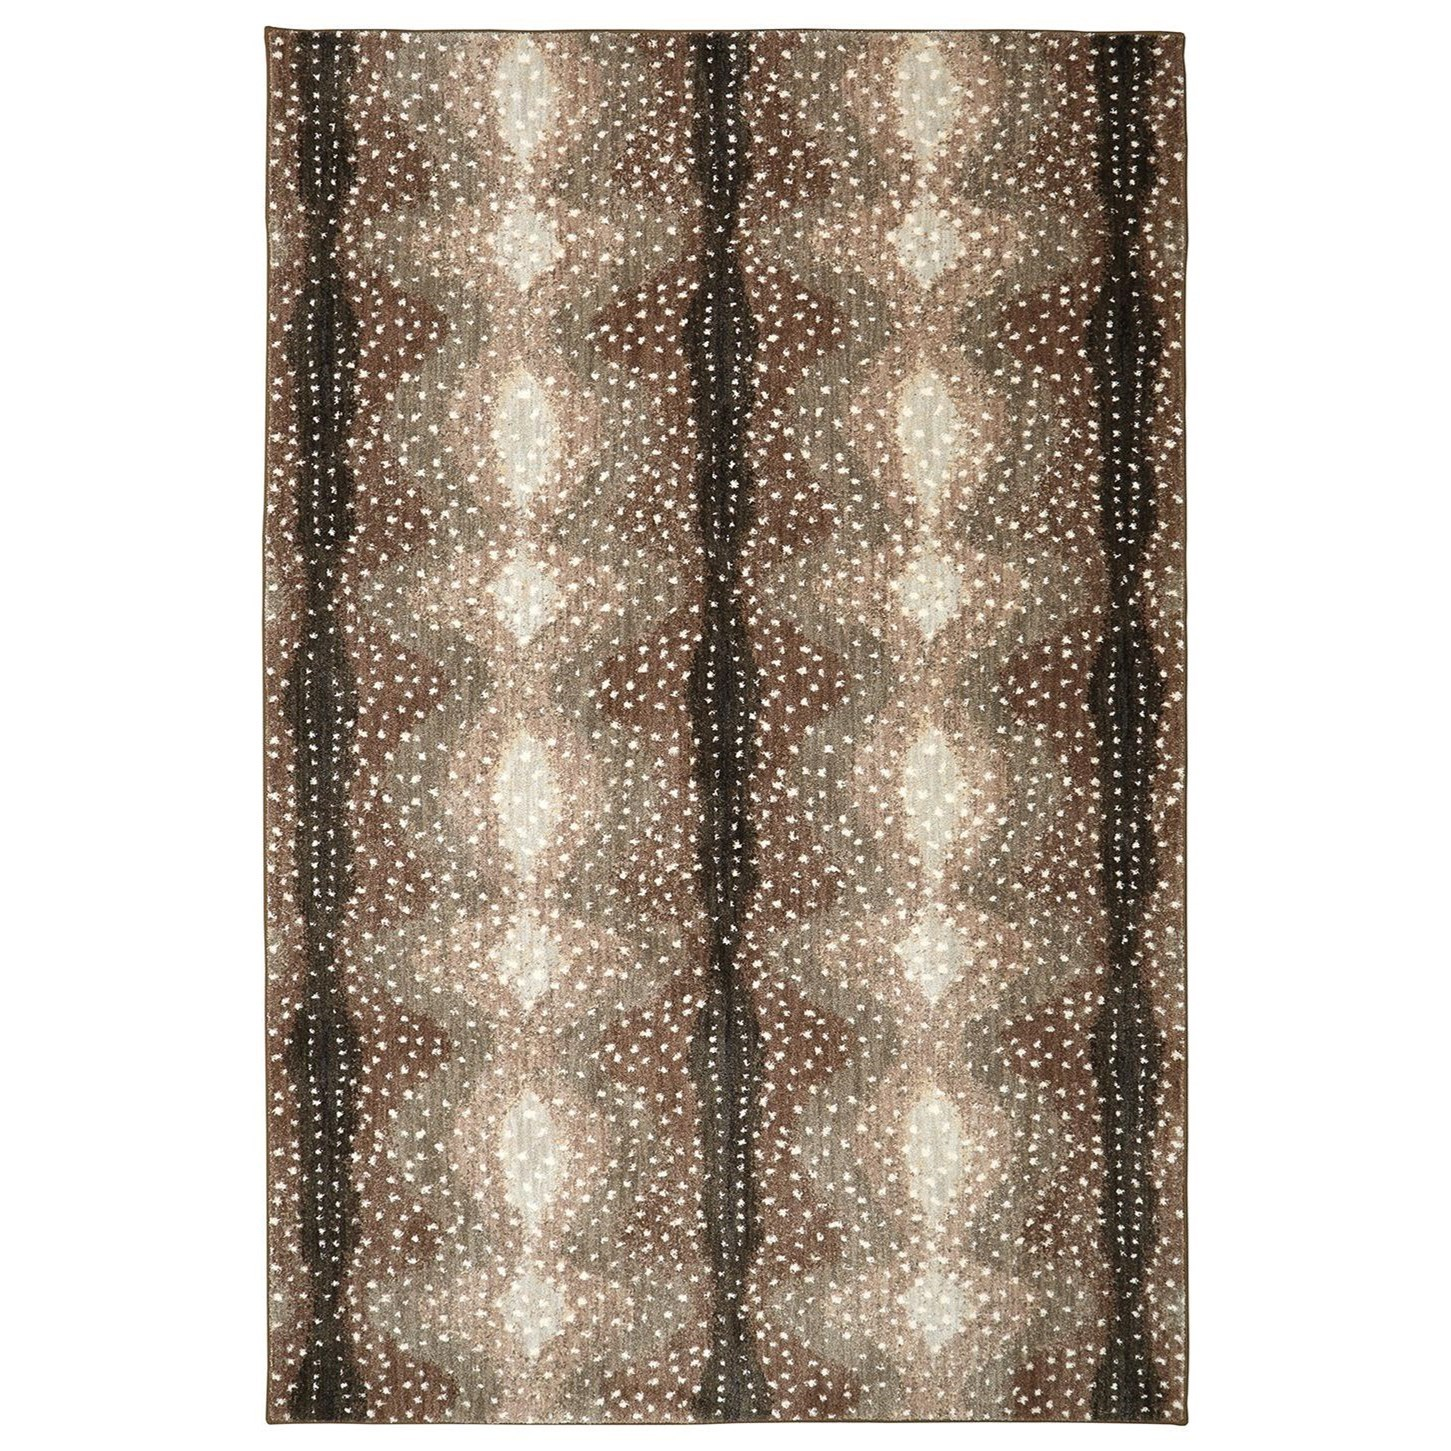 Karastan Rugs Euphoria 9'6x12'11 Forfar Hazelnut Rug - Item Number: 90645 80174 114155